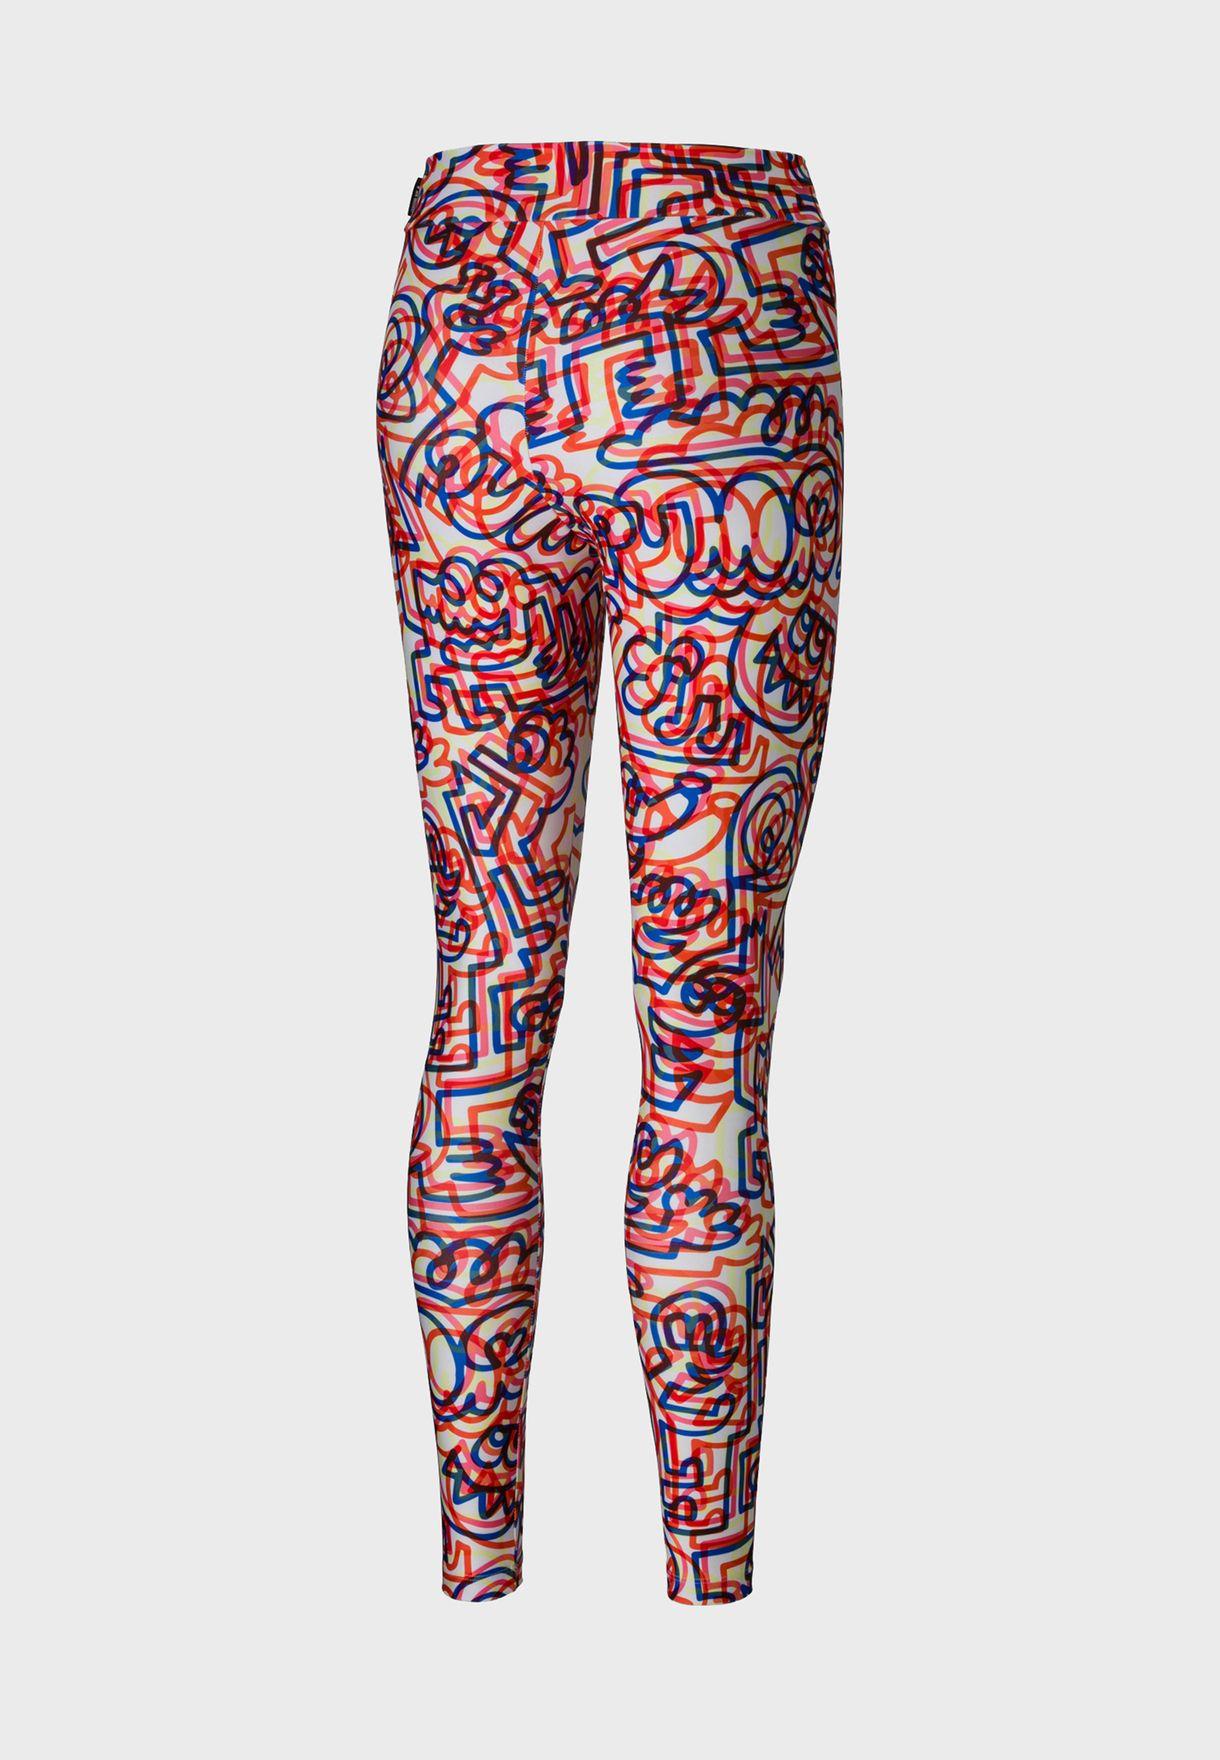 Mr. Doodle AOP Leggings